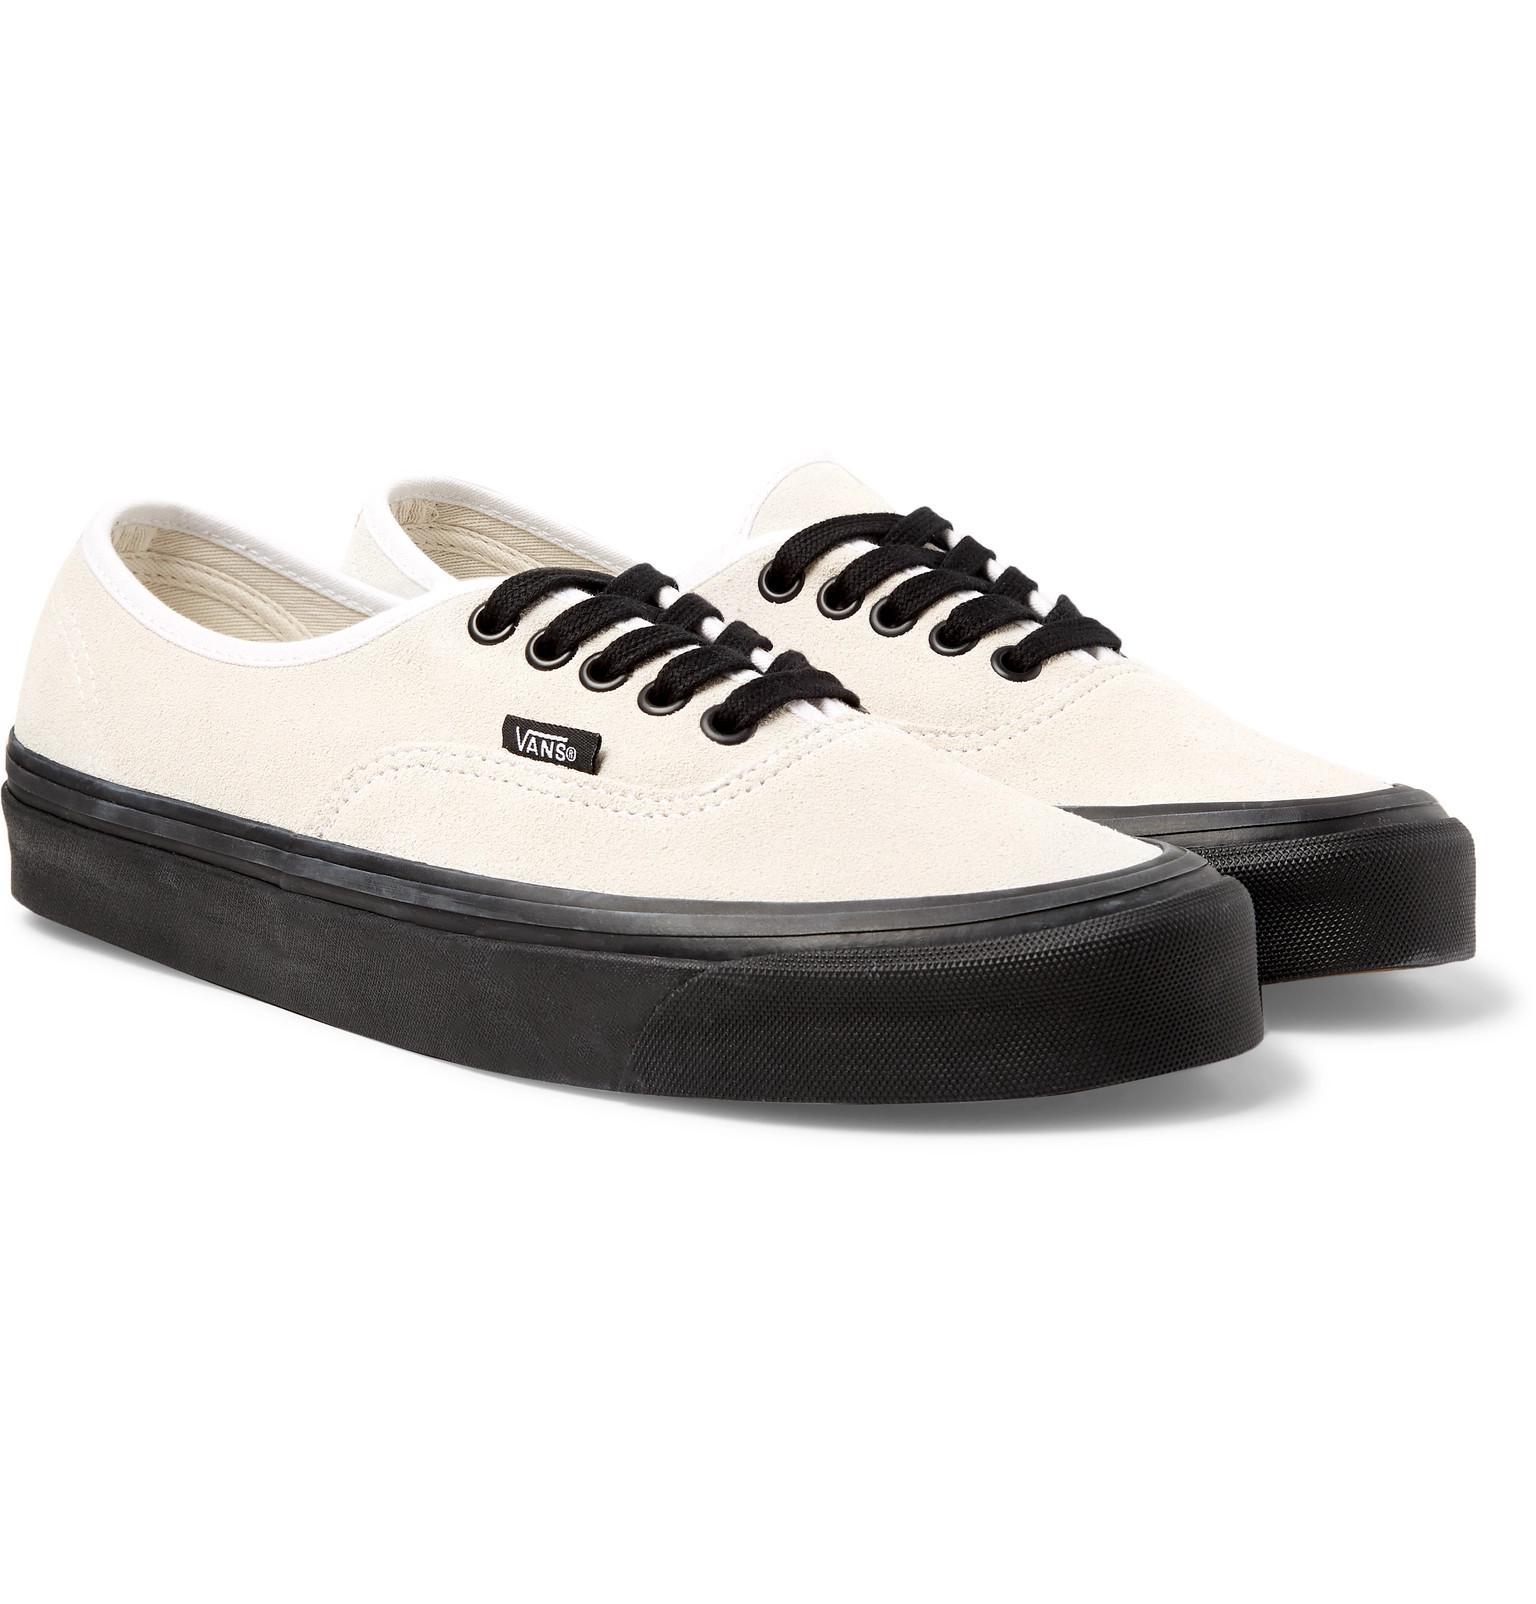 Lyst - Vans Anaheim Authentic 44 Dx Suede Sneakers in White for Men d80d59c0c